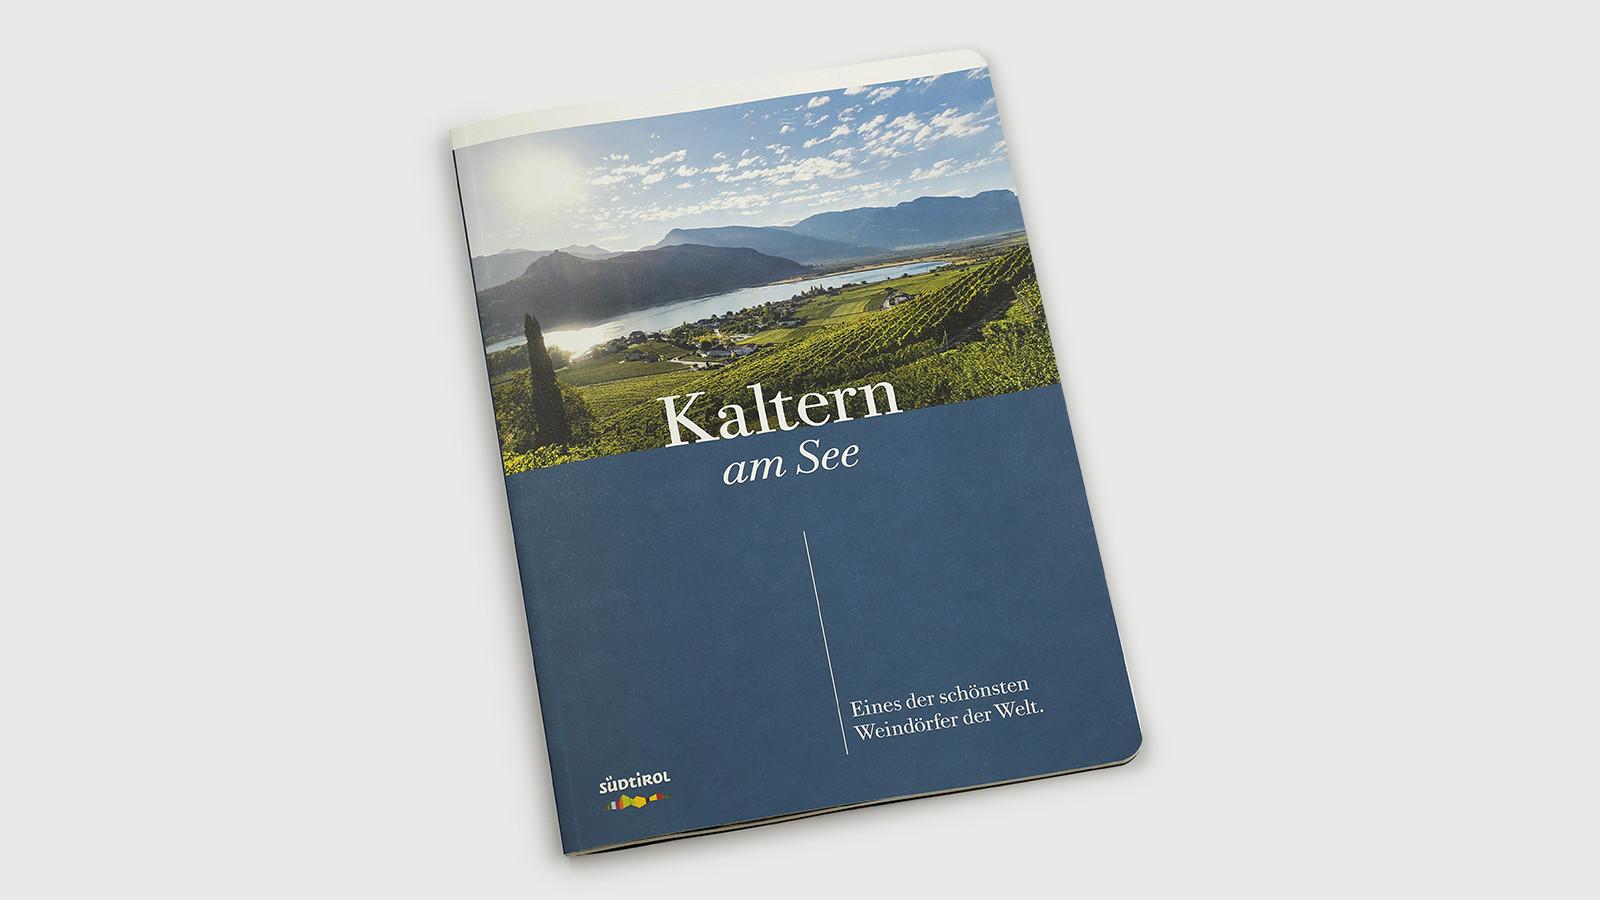 Prospekt_Kaltern_am_See_01.jpg